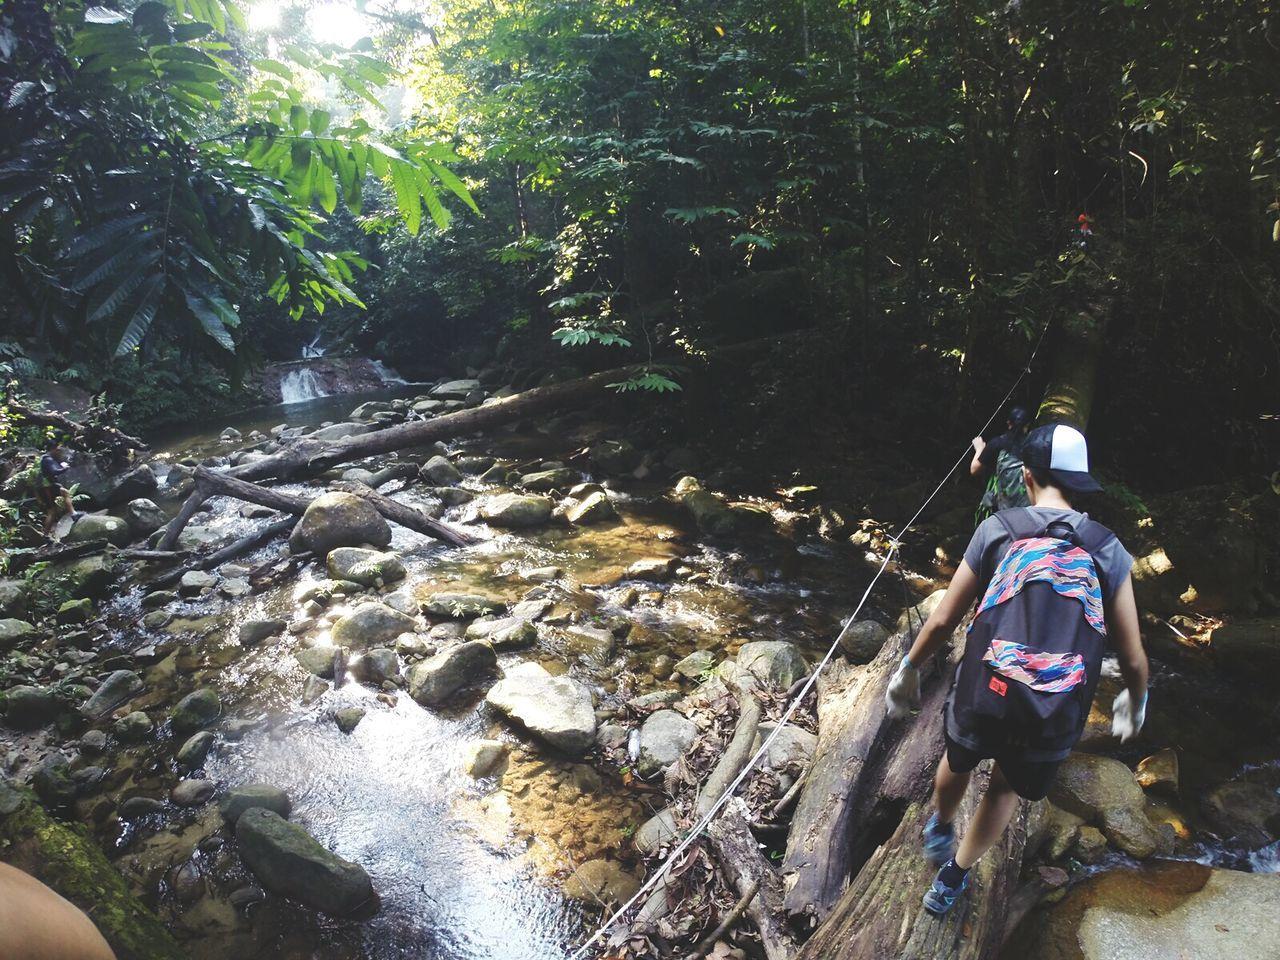 Rear View Of Man On Fallen Tree Crossing River In Forest